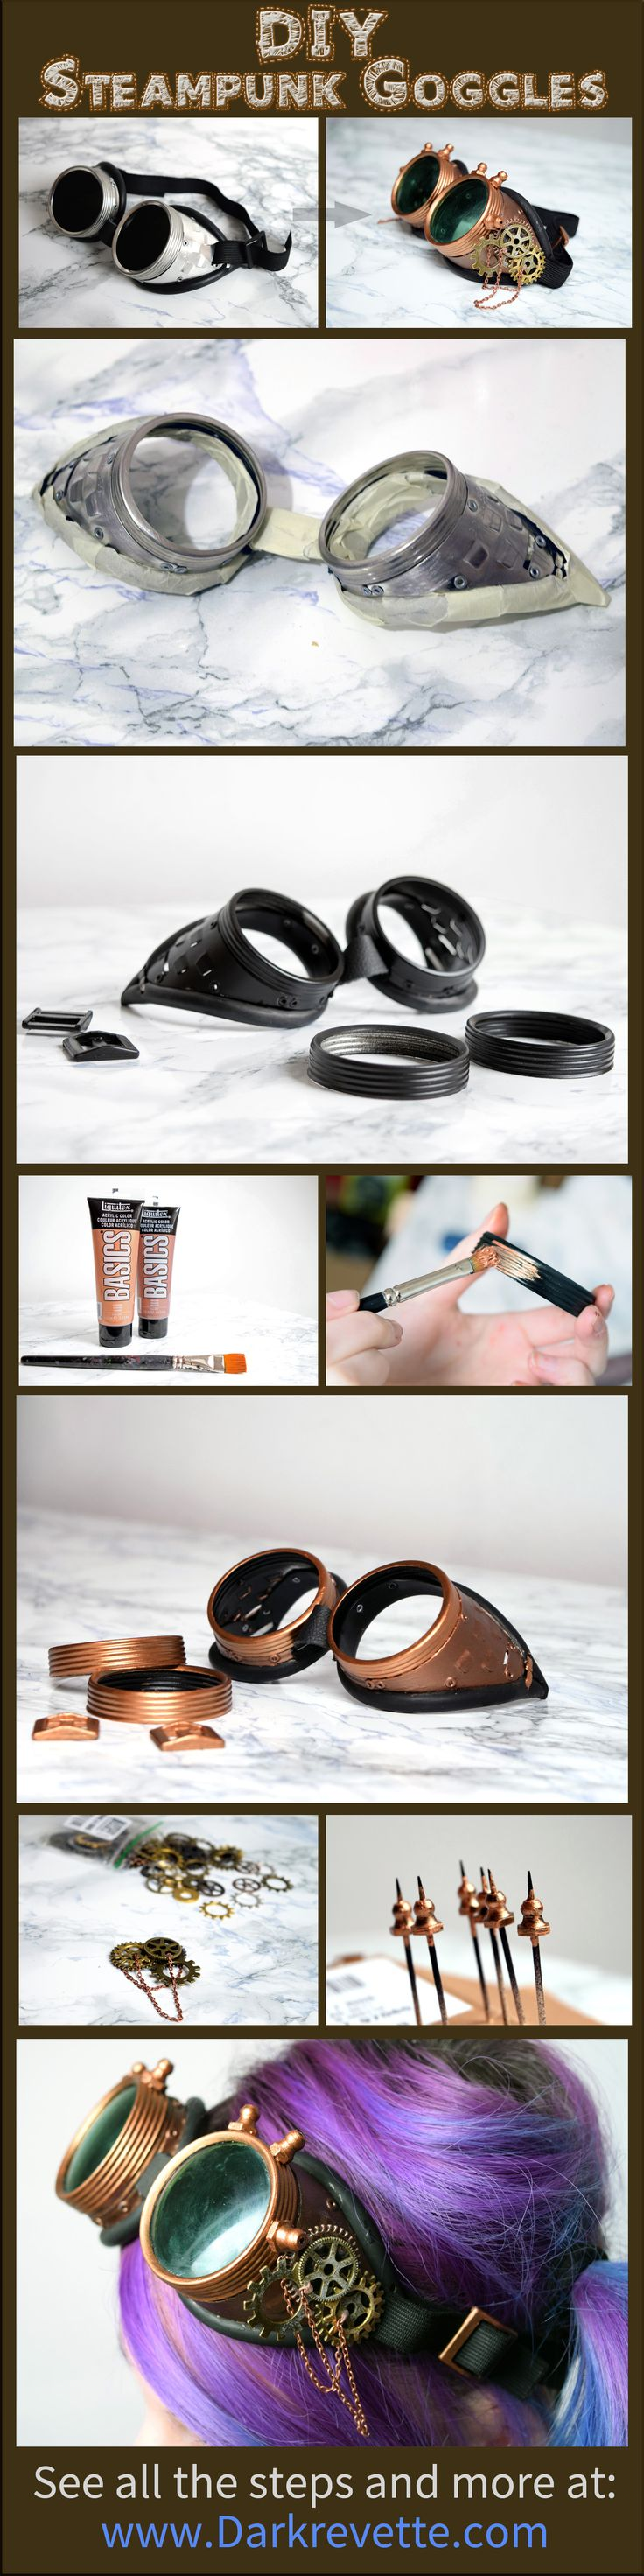 DIY and tutorials: Steampunk goggles ~ Darkrevette                                                                                                                                                      More